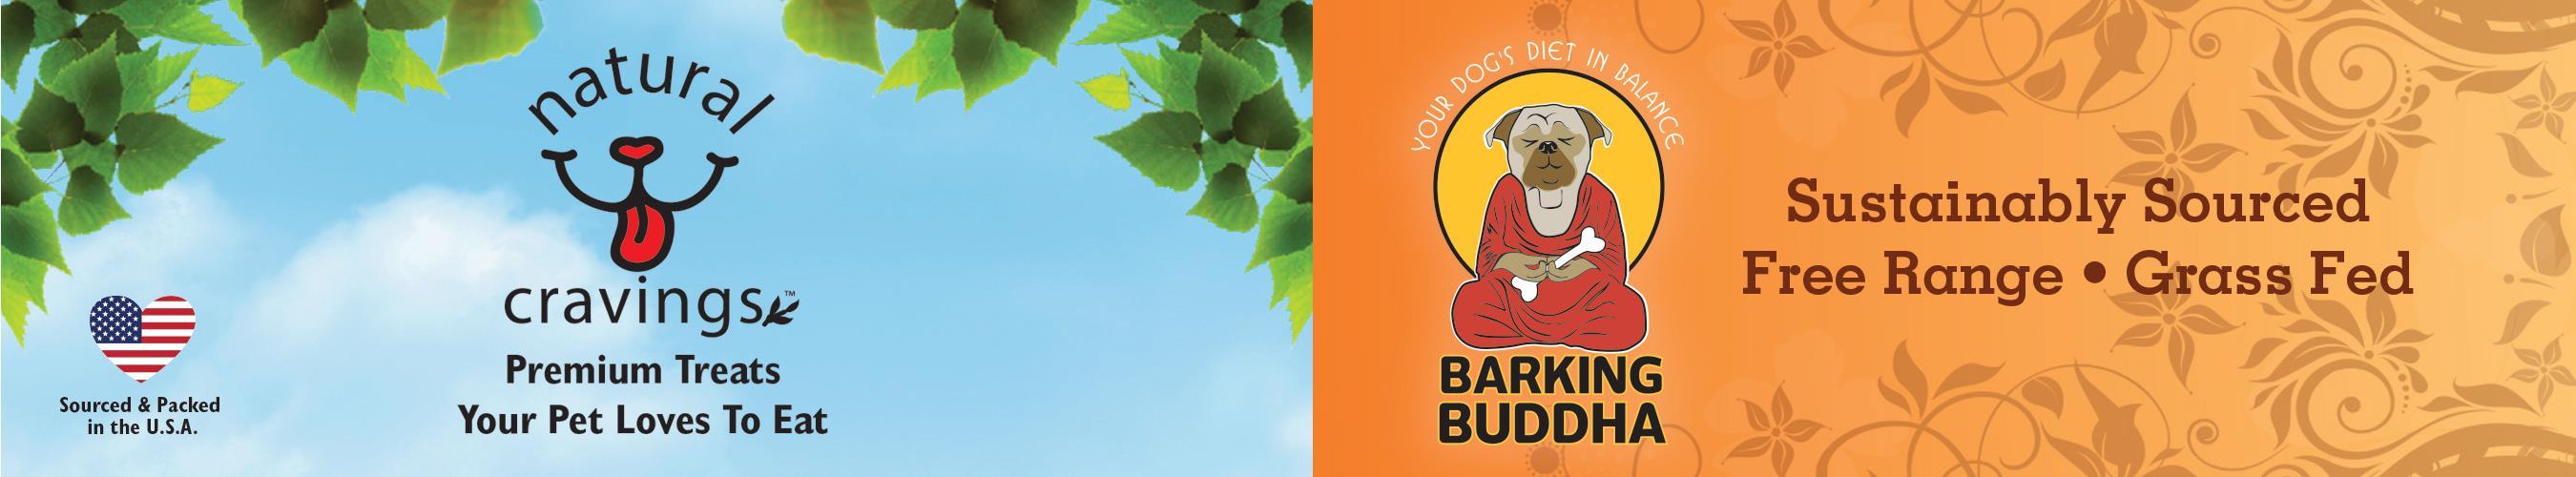 Natural Cravings Pet Treats & Barking Buddha Pet Products